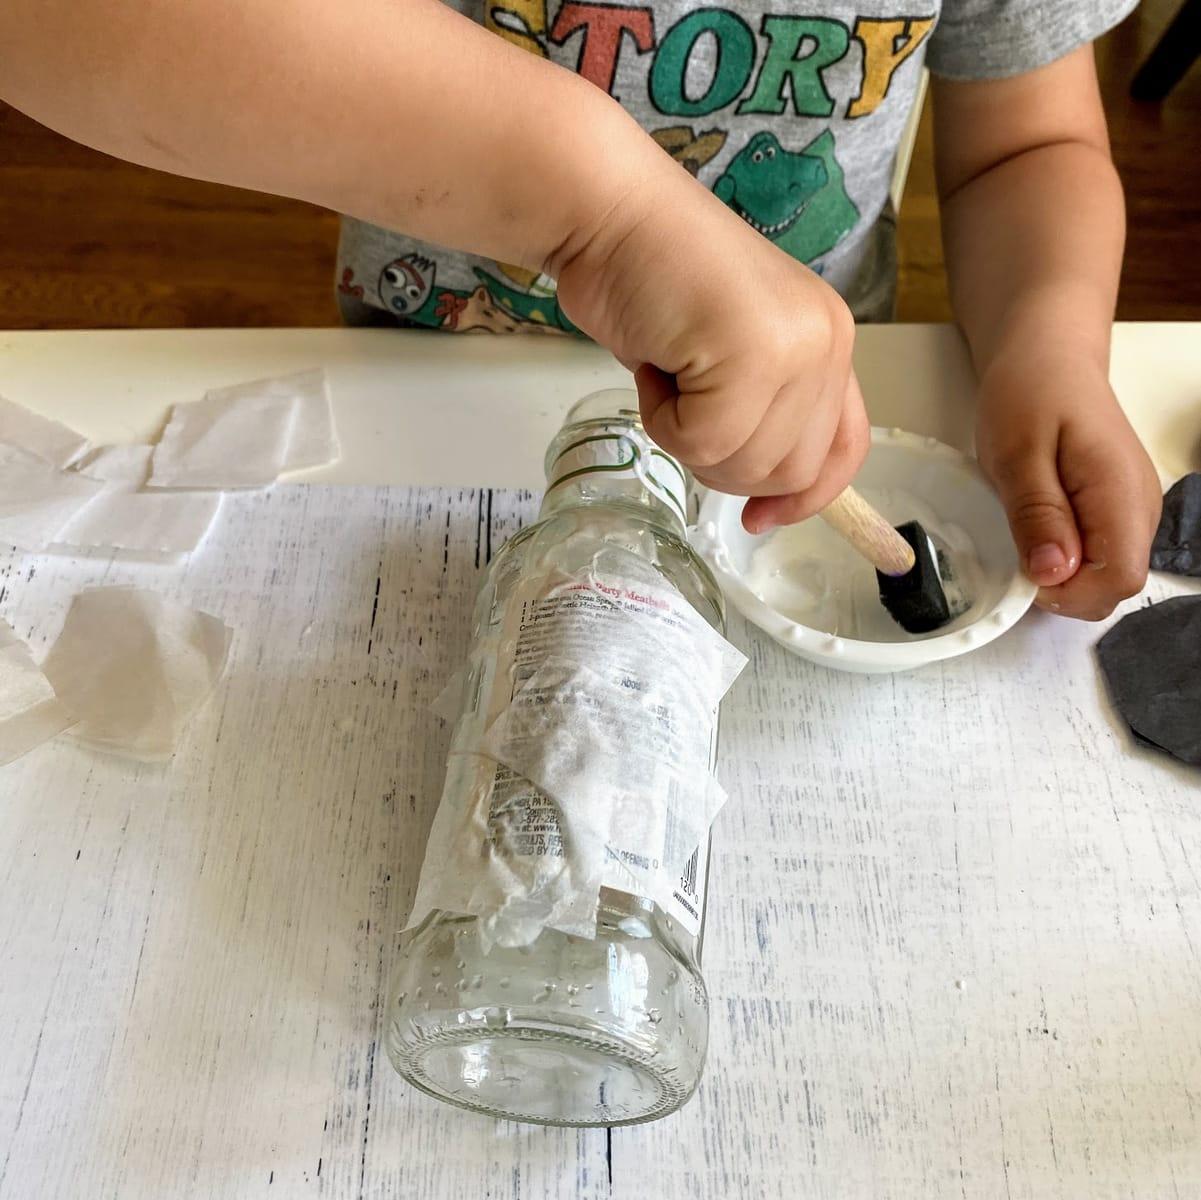 pasting white tissue paper to bottle